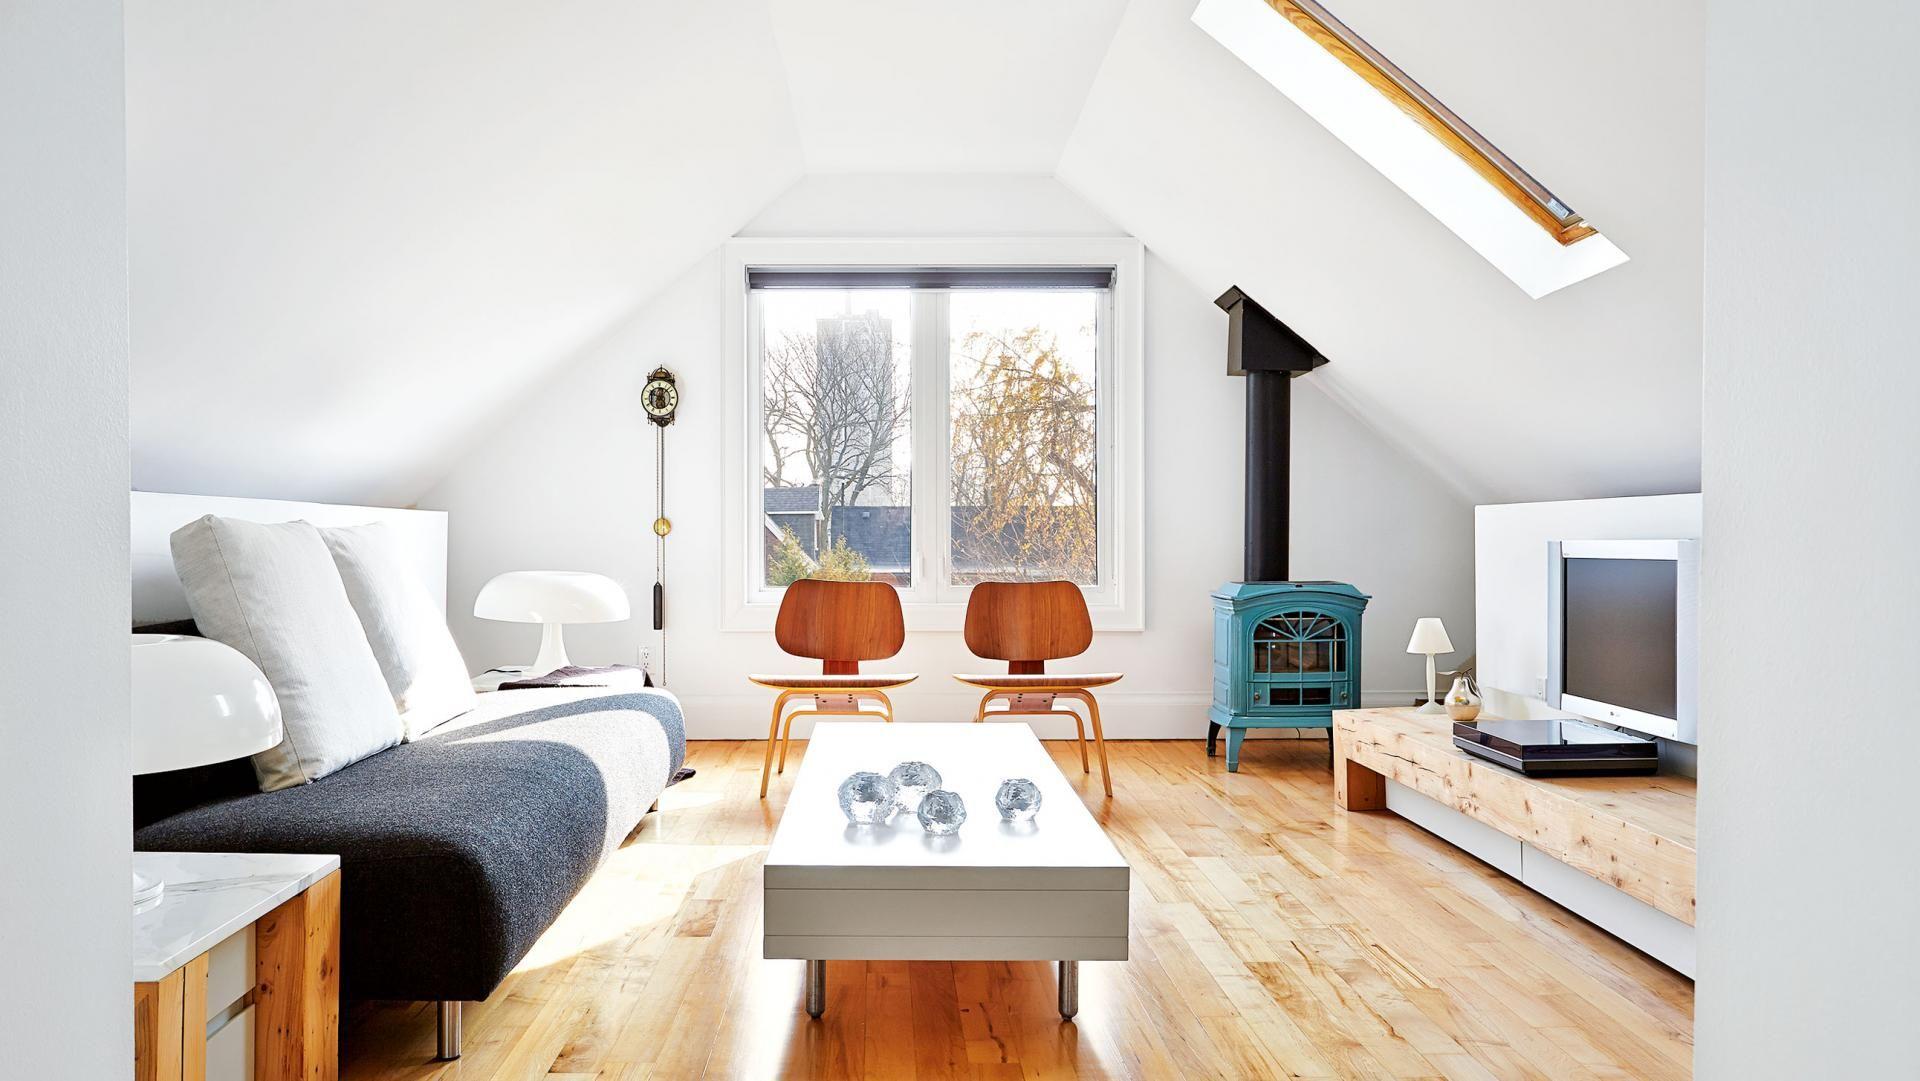 30 Attic Living Room Ideas Adorable Home Attic Living Rooms Minimalist Living Room Living Room Scandinavian